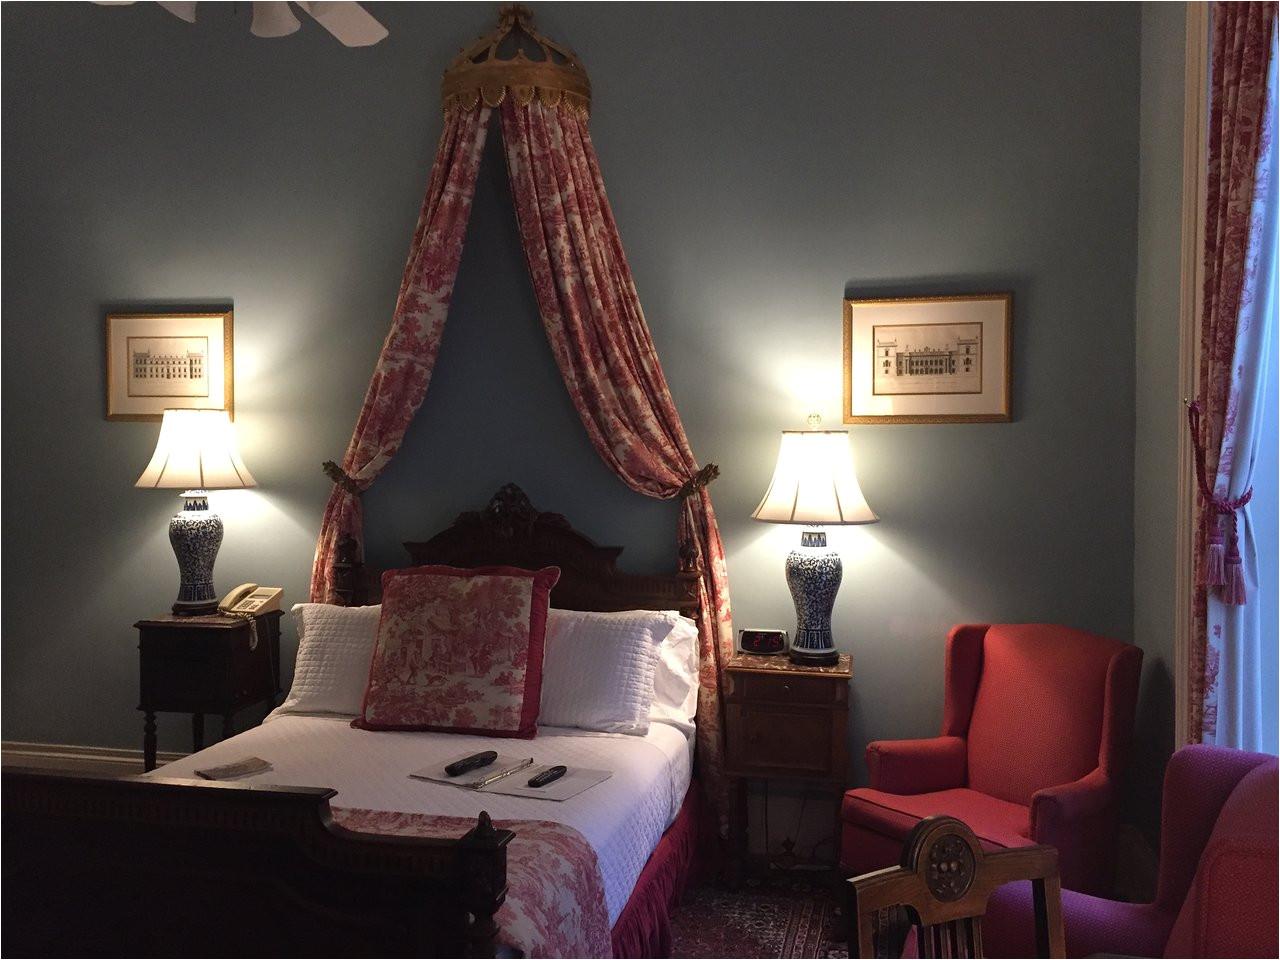 noble inns the oge house inn on the riverwalk desde 3 223 san antonio texas opiniones y comentarios b b tripadvisor